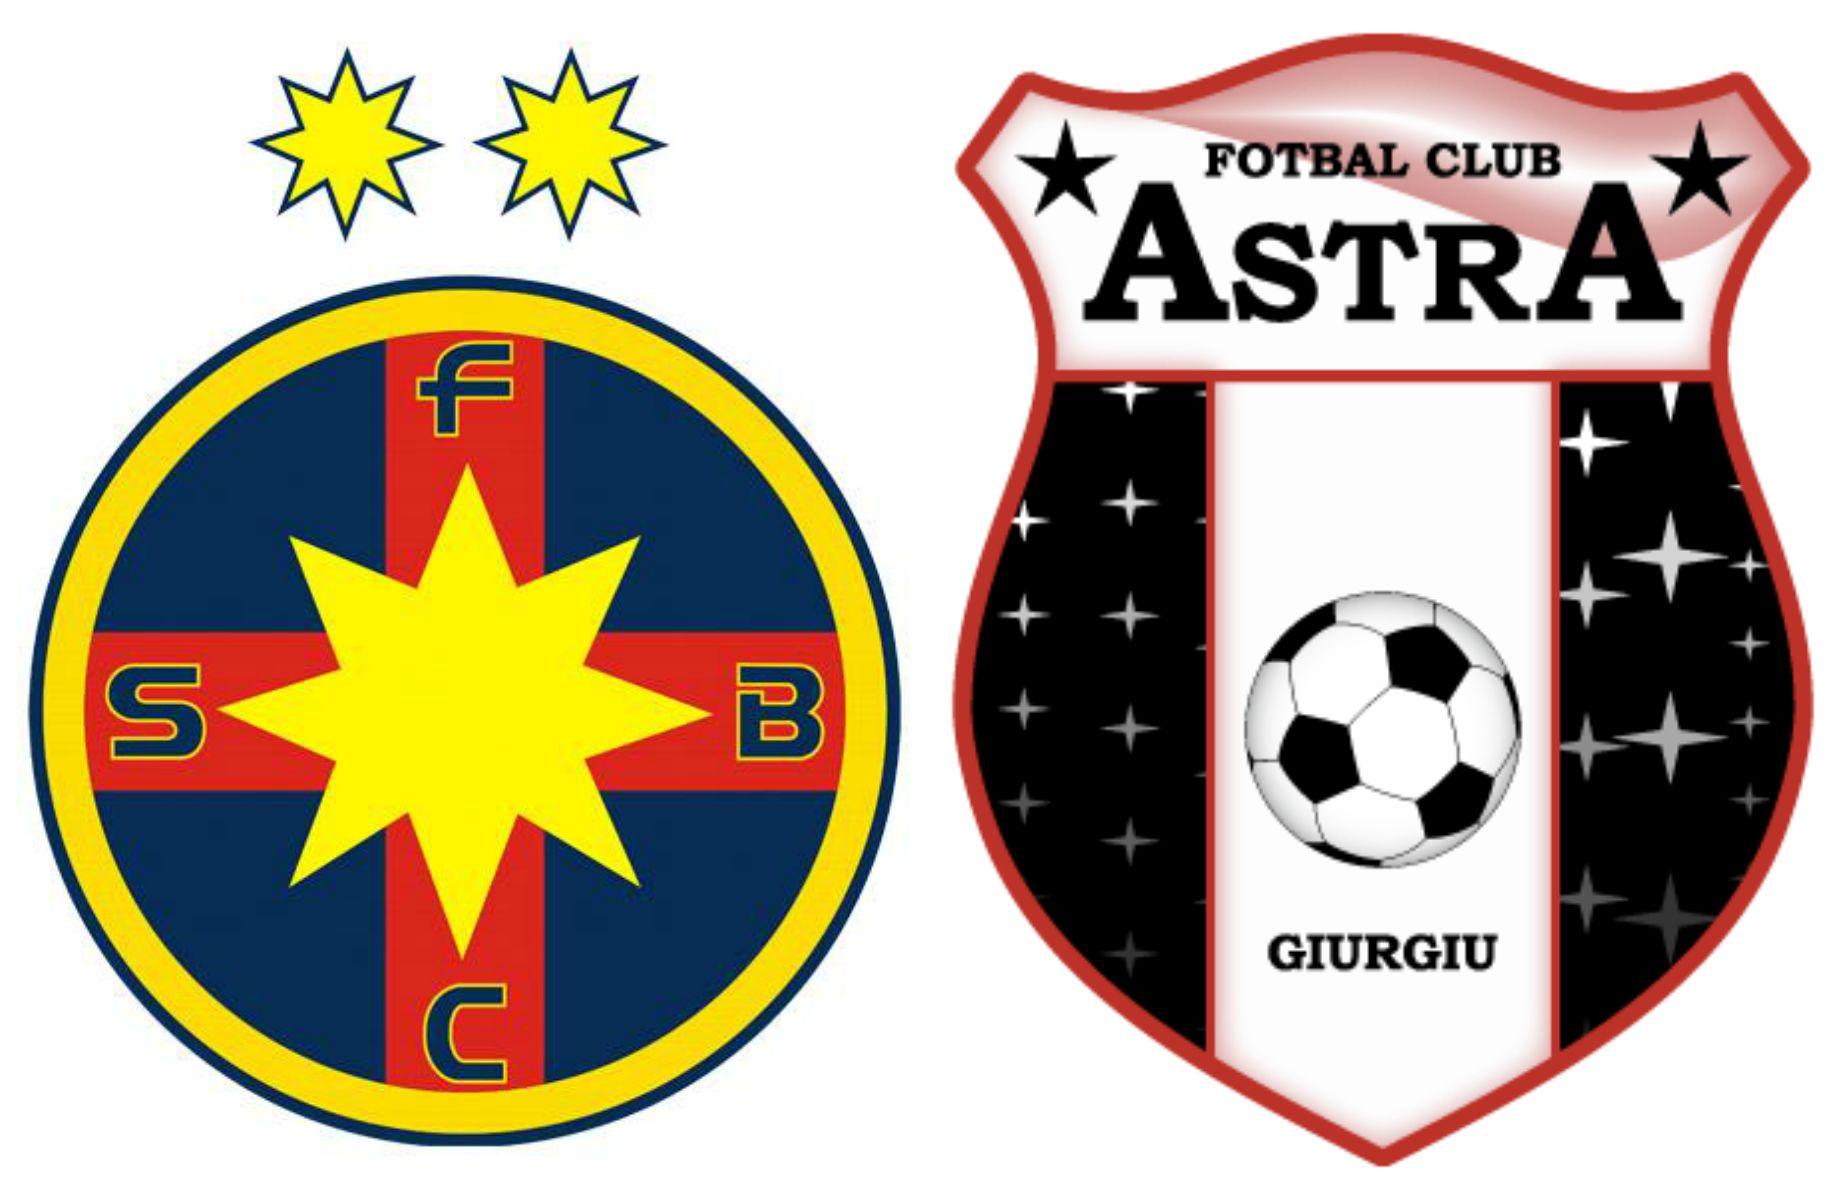 Ponturi Fotbal FCSB – Astra Giurgiu – România Liga 1 play-off